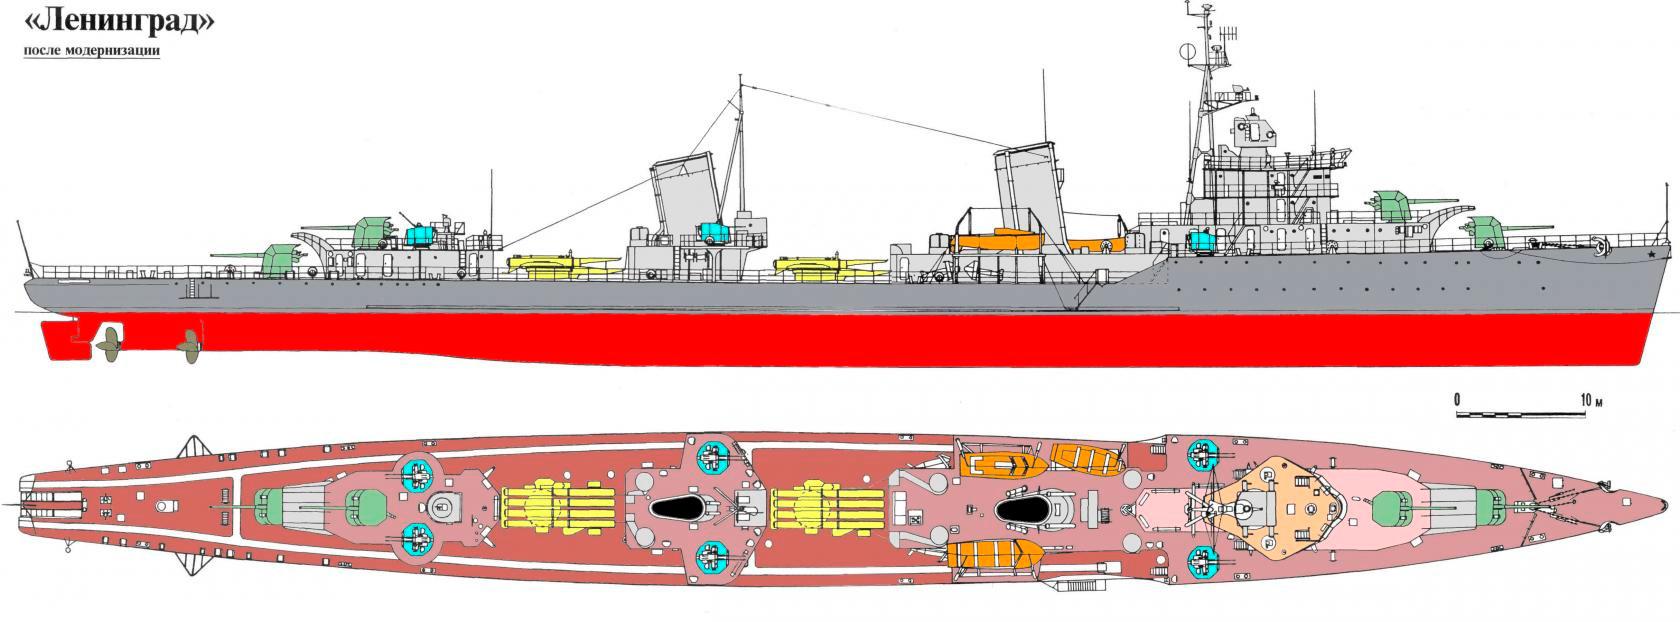 Общий вид лидеров эсминцев типа «Ленинград» (Проект 1)